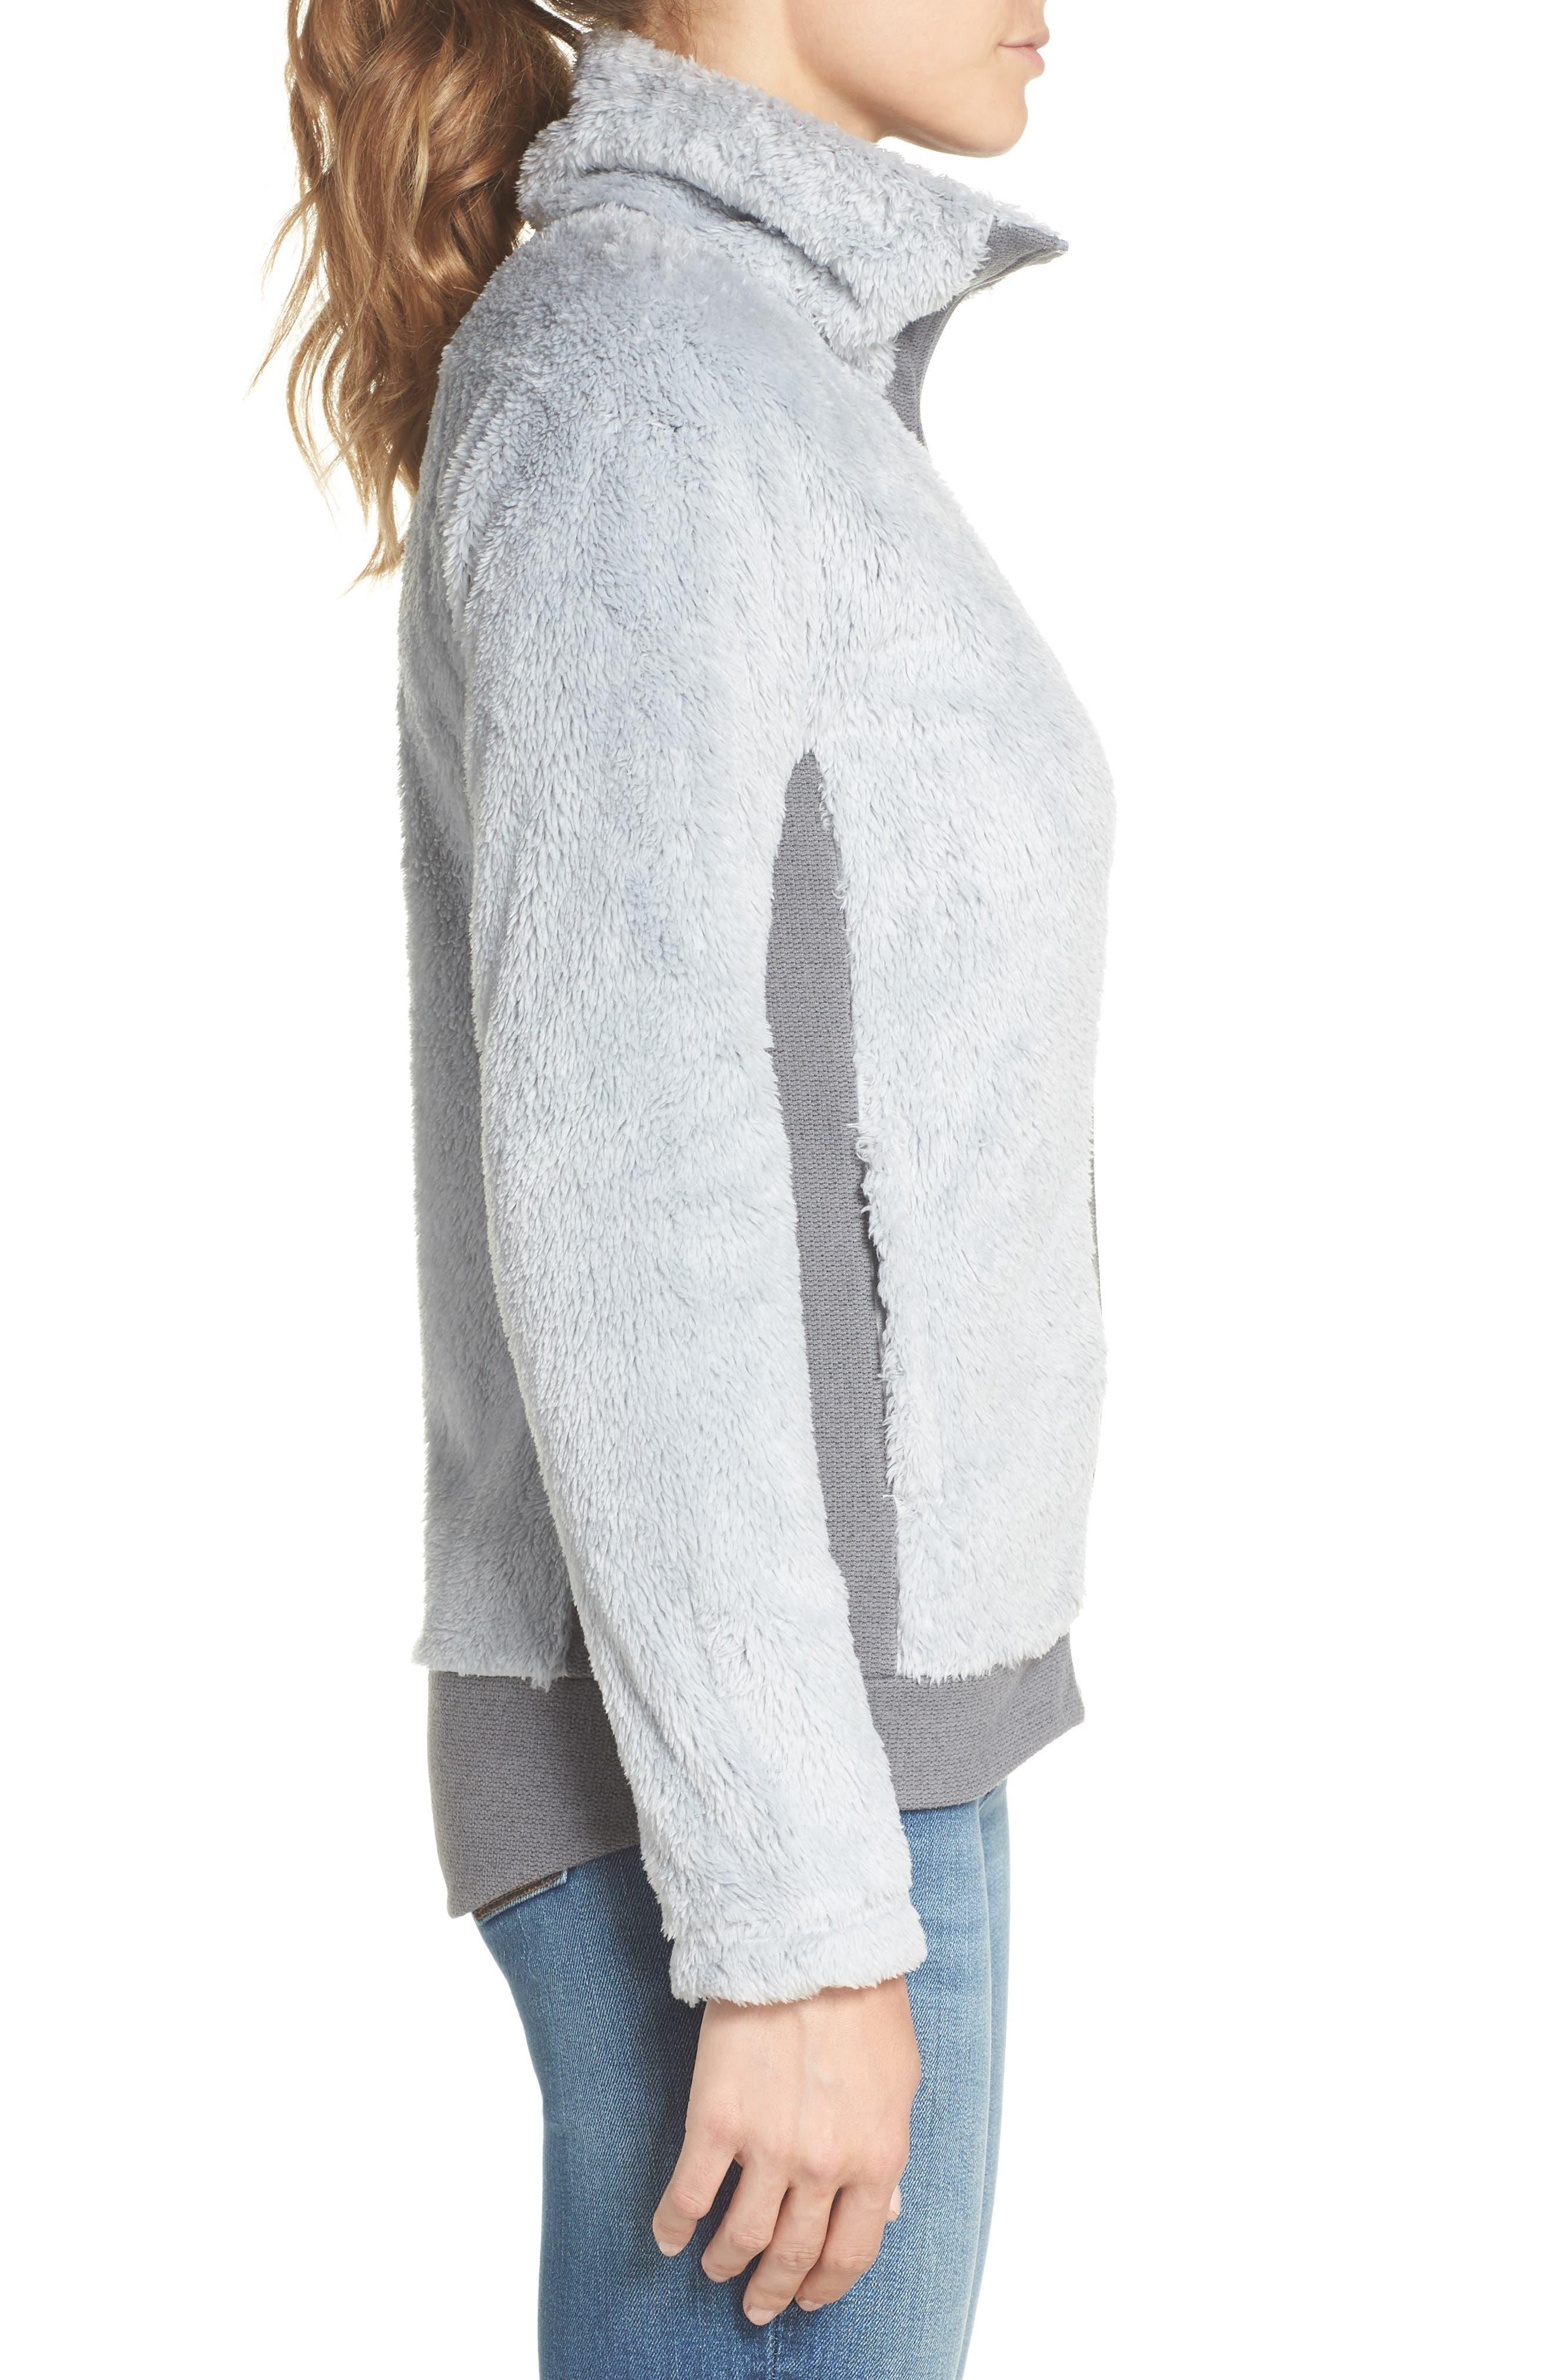 Furry Fleece Jacket,                             Alternate thumbnail 3, color,                             High Rise Grey